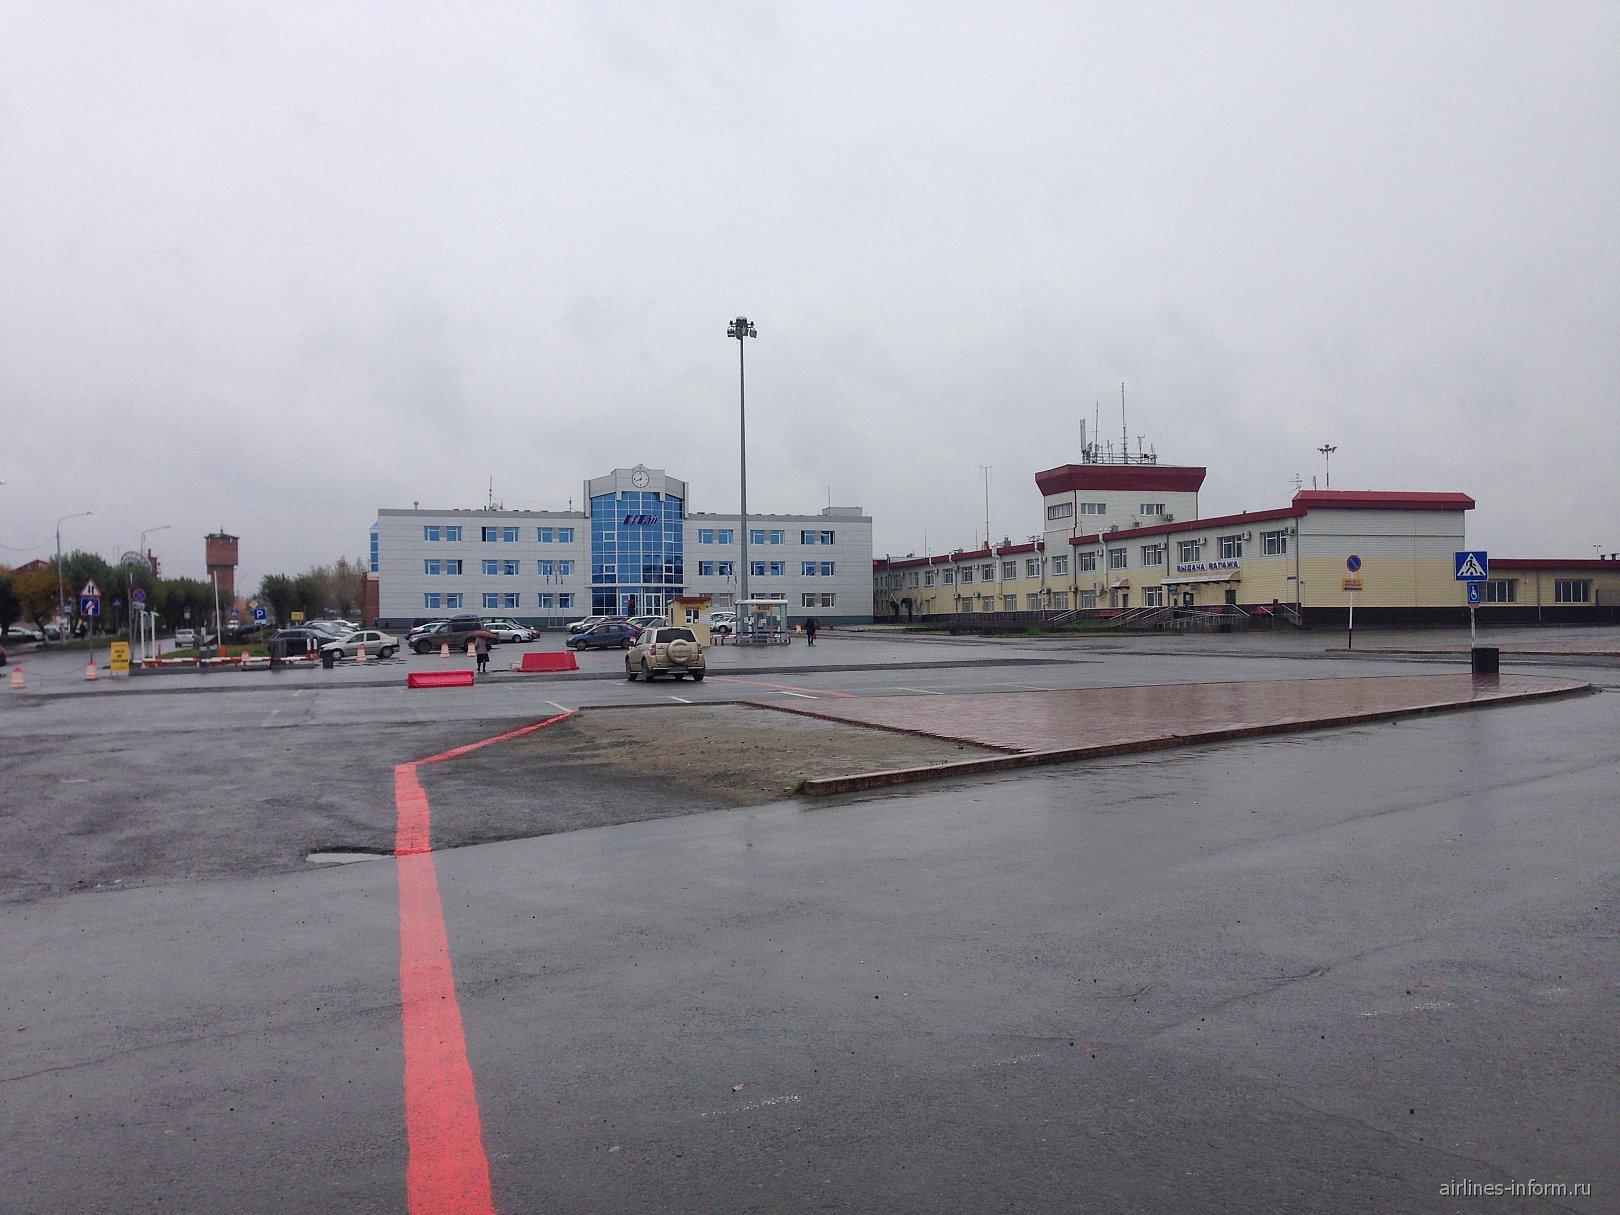 "Терминал выдачи багажа и офис авиакомпании ""ЮТэйр"" в аэропорту Тюмень Рощино"